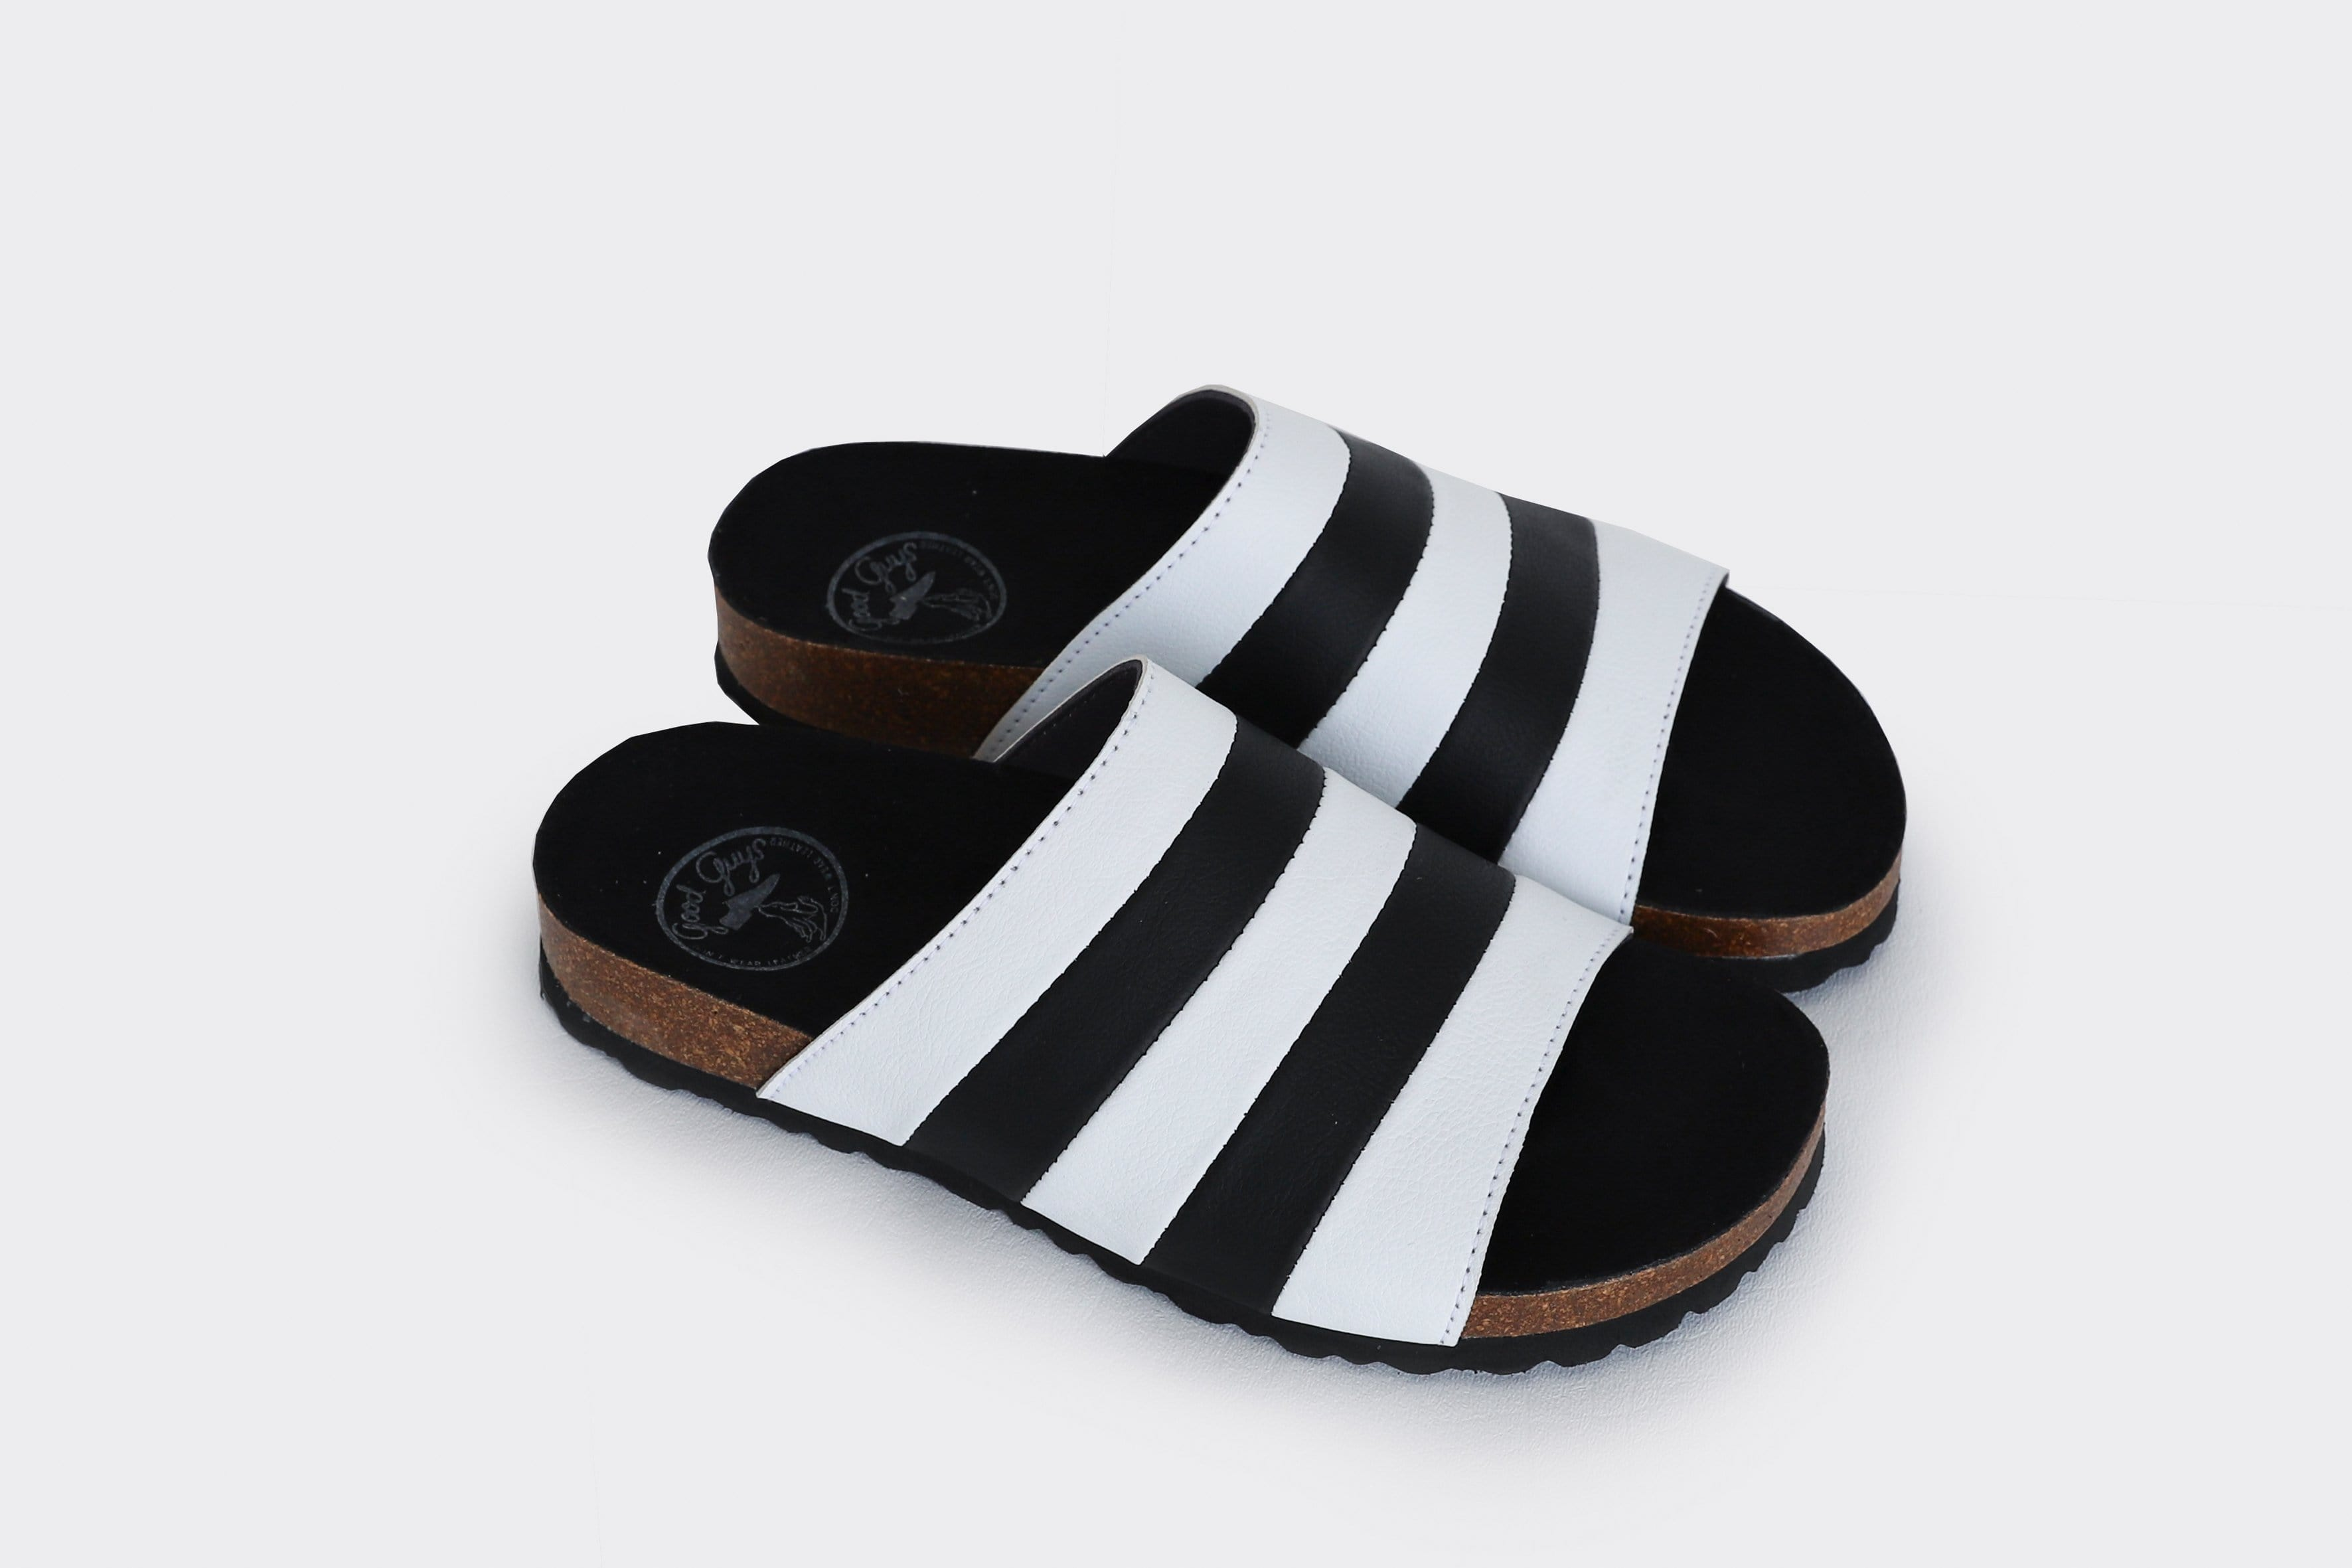 Good Guys Don't Wear Leather Jerry Apple Leather Vegan Slide-On Sandal | Black & White